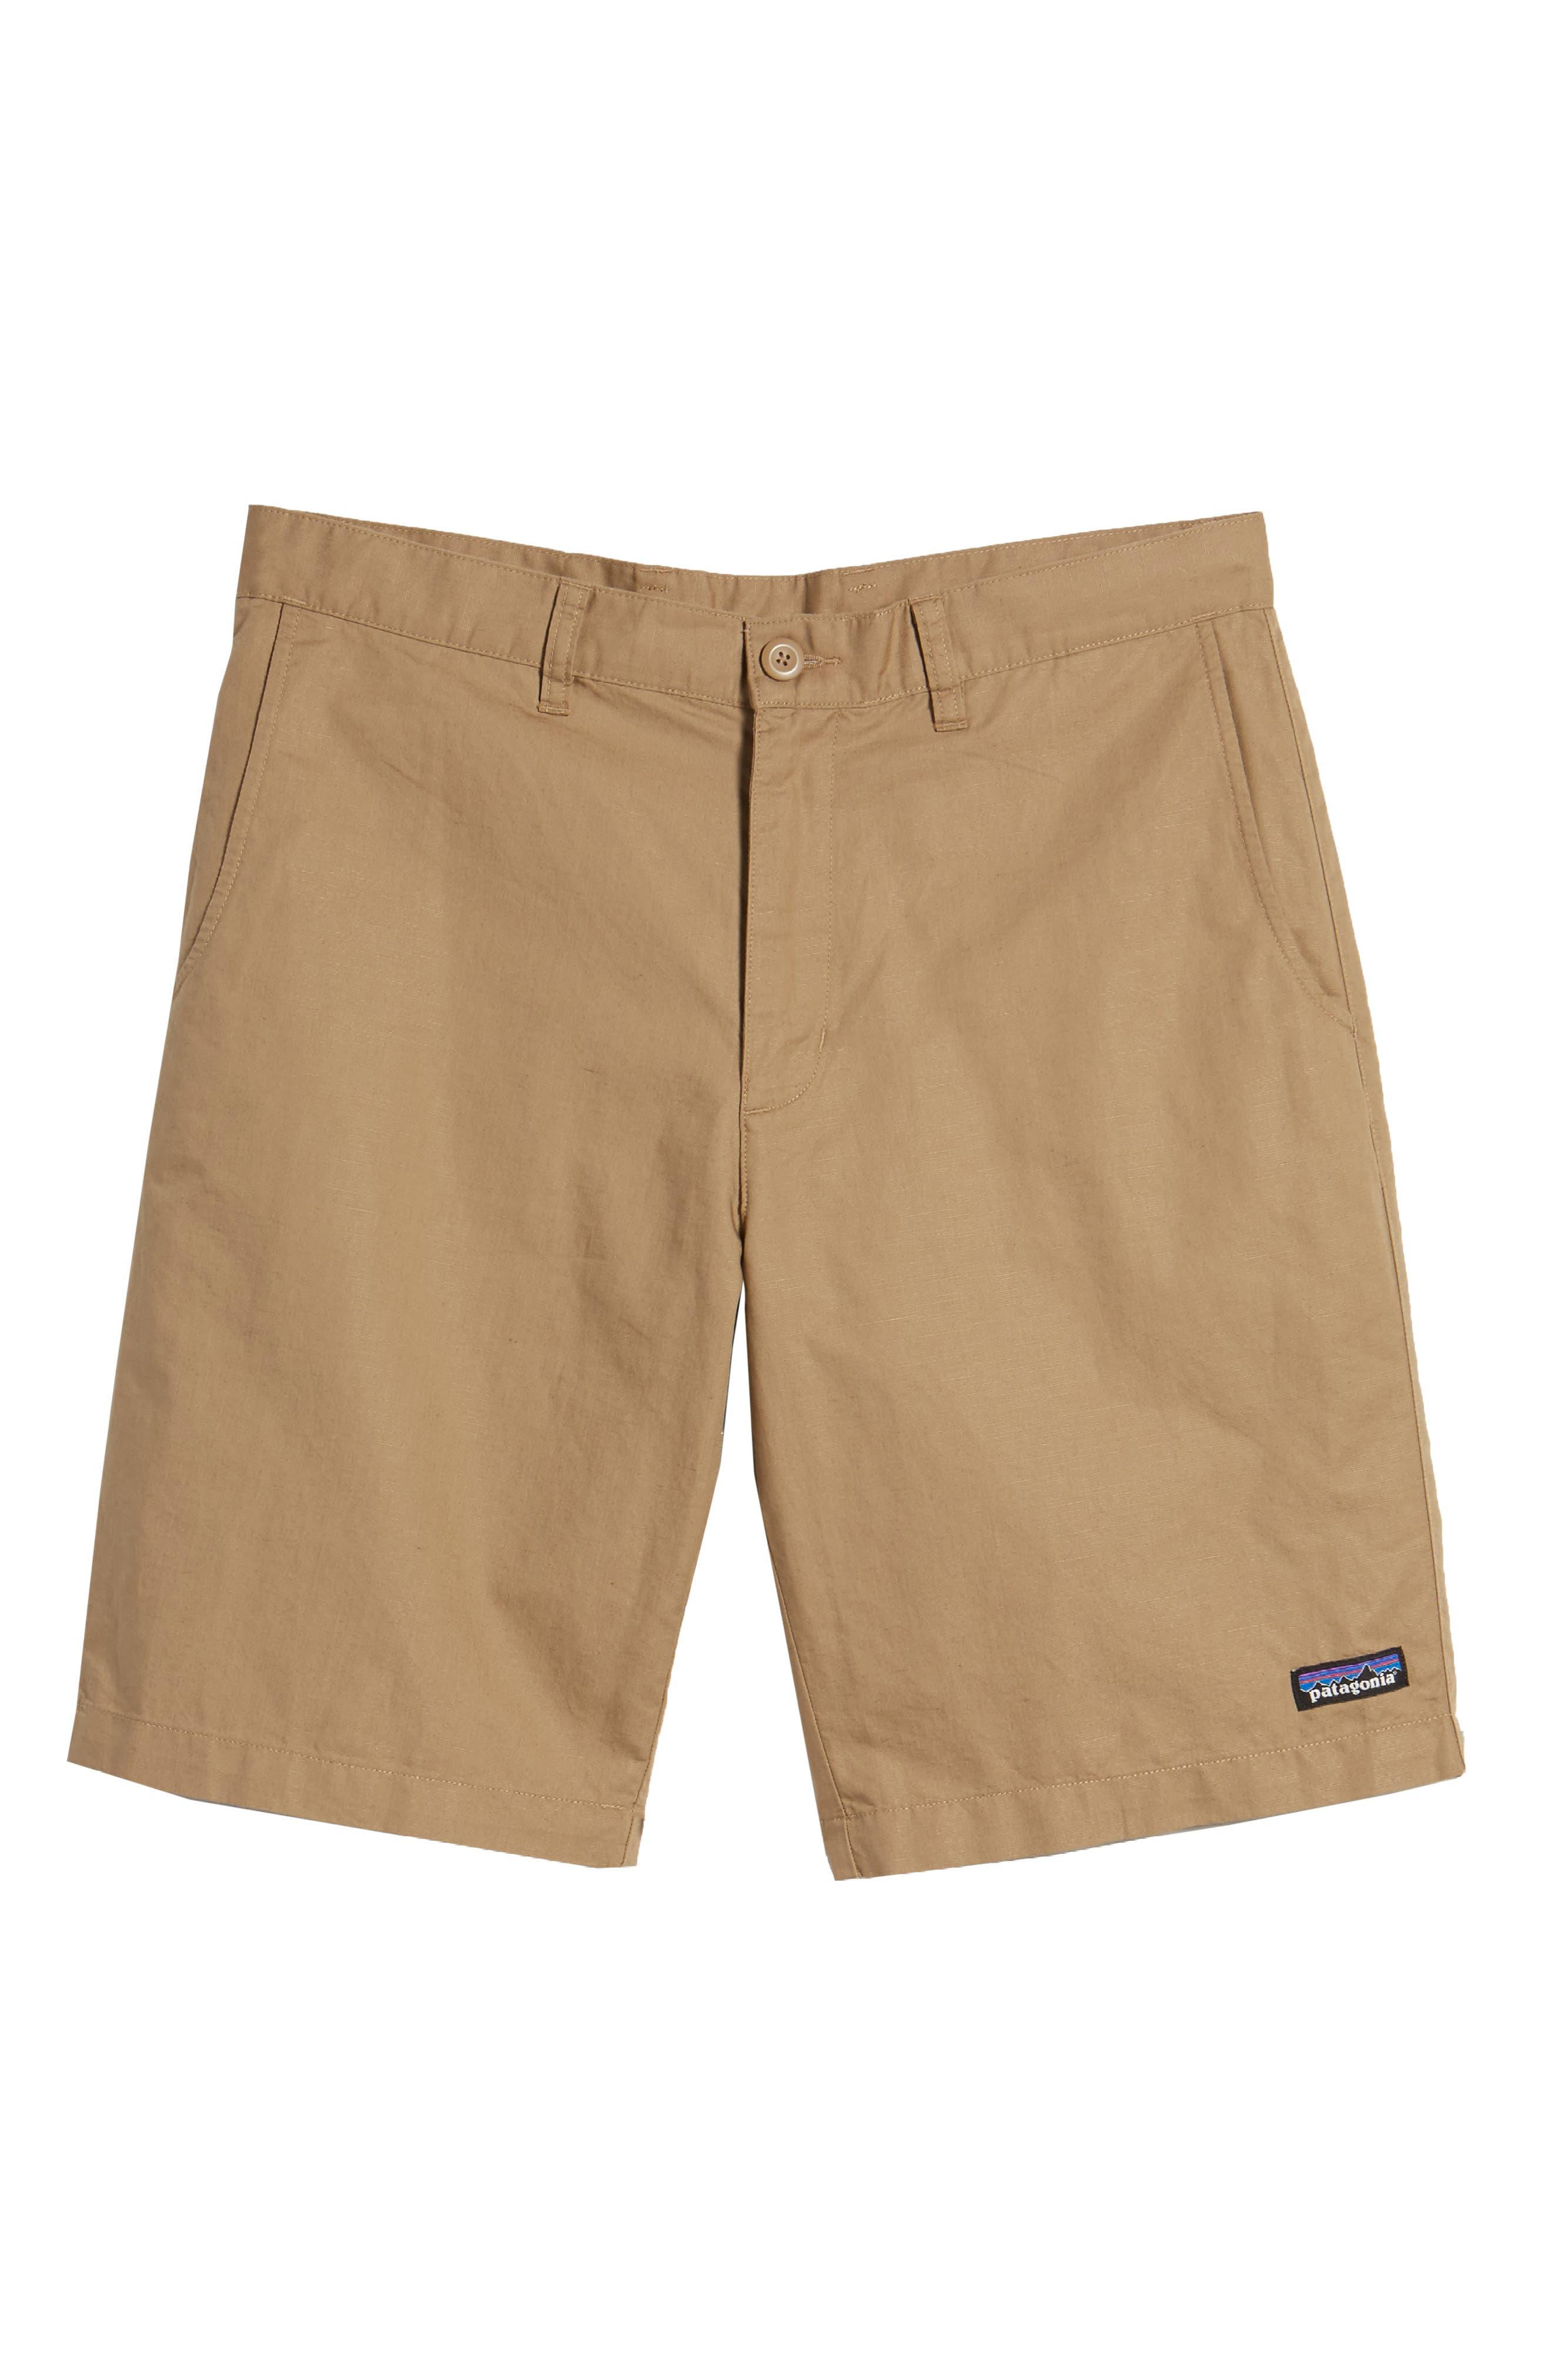 M's Lightweight All-Wear Shorts,                             Alternate thumbnail 6, color,                             Mojave Khaki